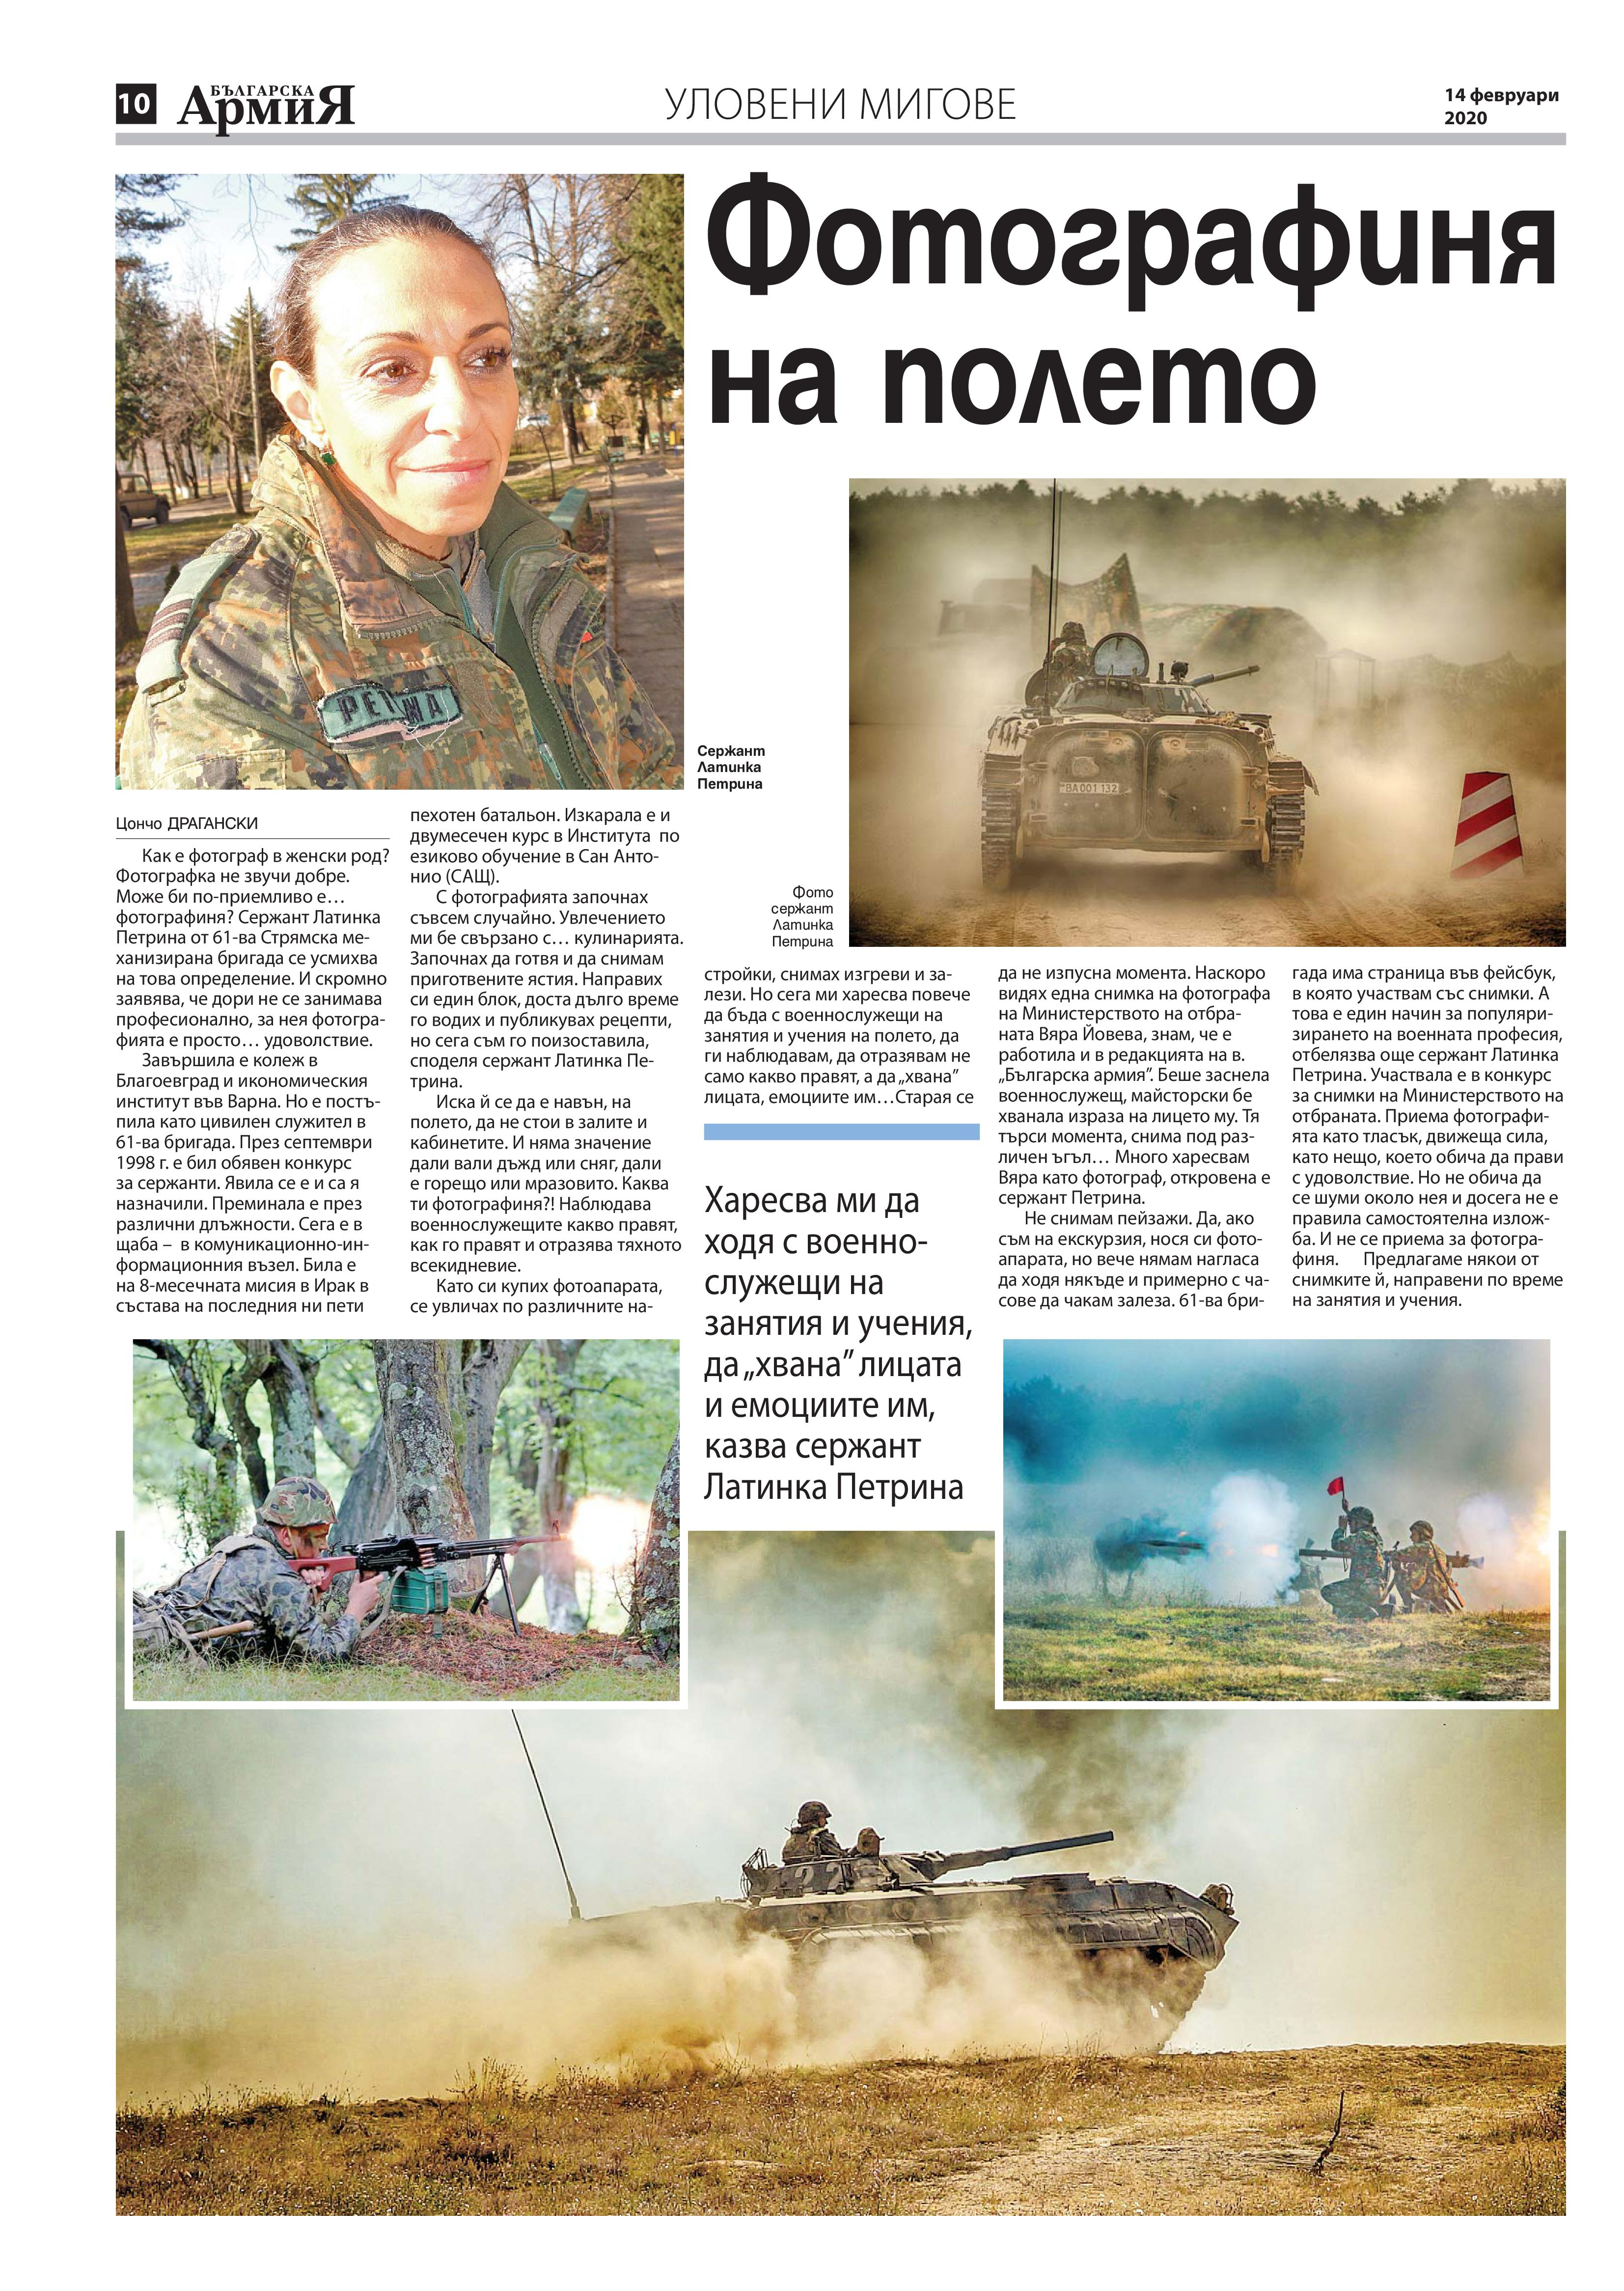 https://armymedia.bg/wp-content/uploads/2015/06/10-35.jpg